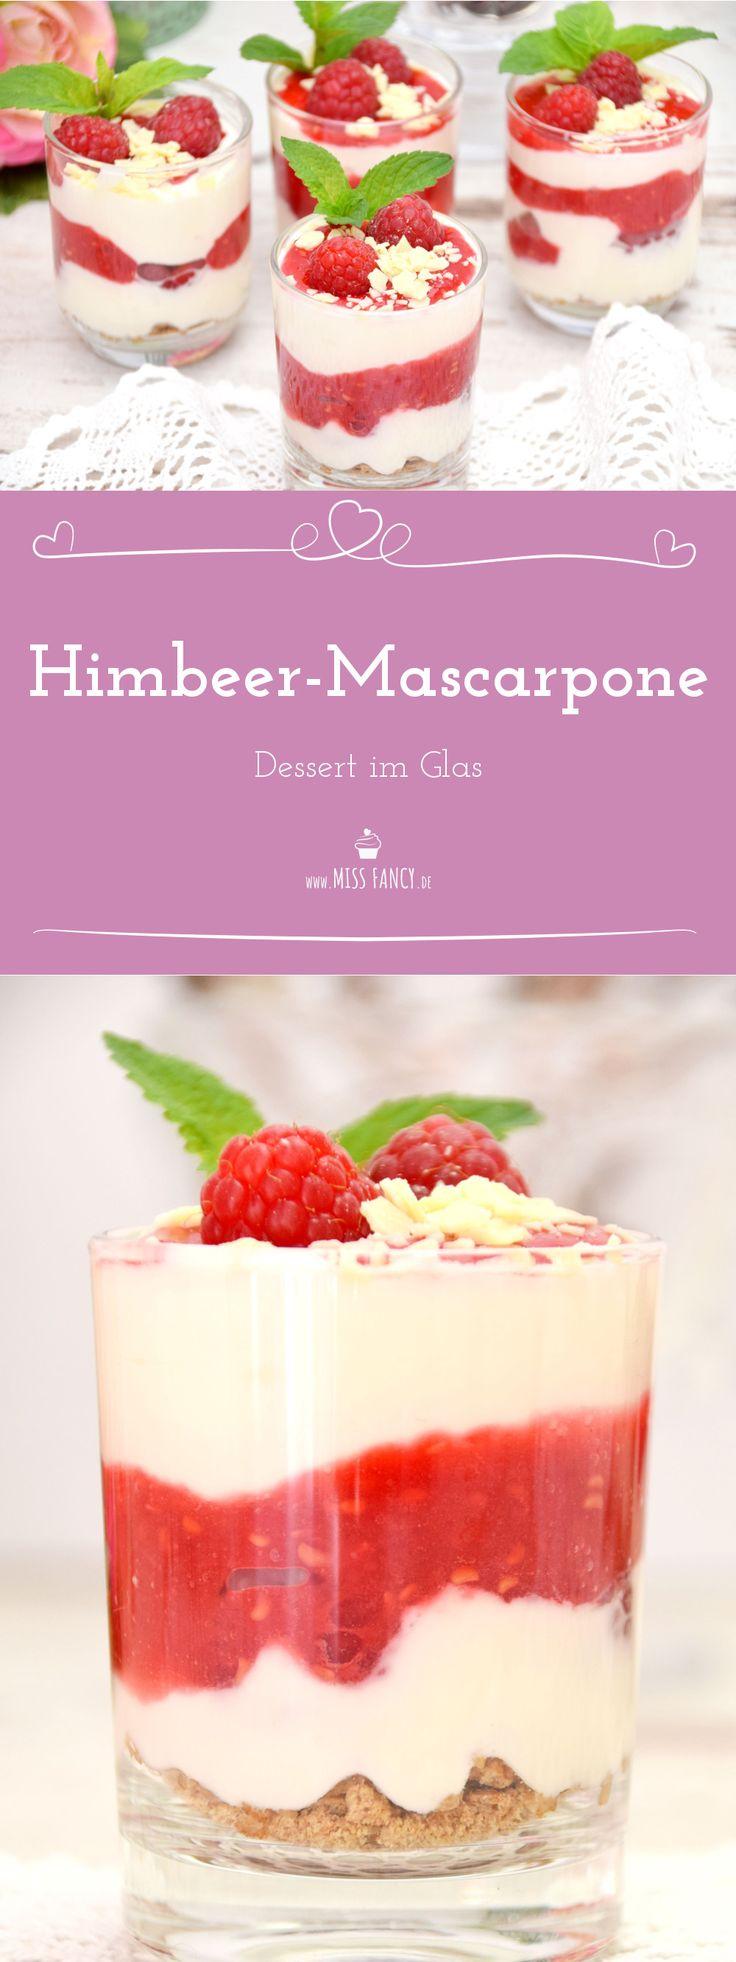 25 best ideas about himbeerdessert on pinterest himbeer dessert dessert im glas and schnelle. Black Bedroom Furniture Sets. Home Design Ideas